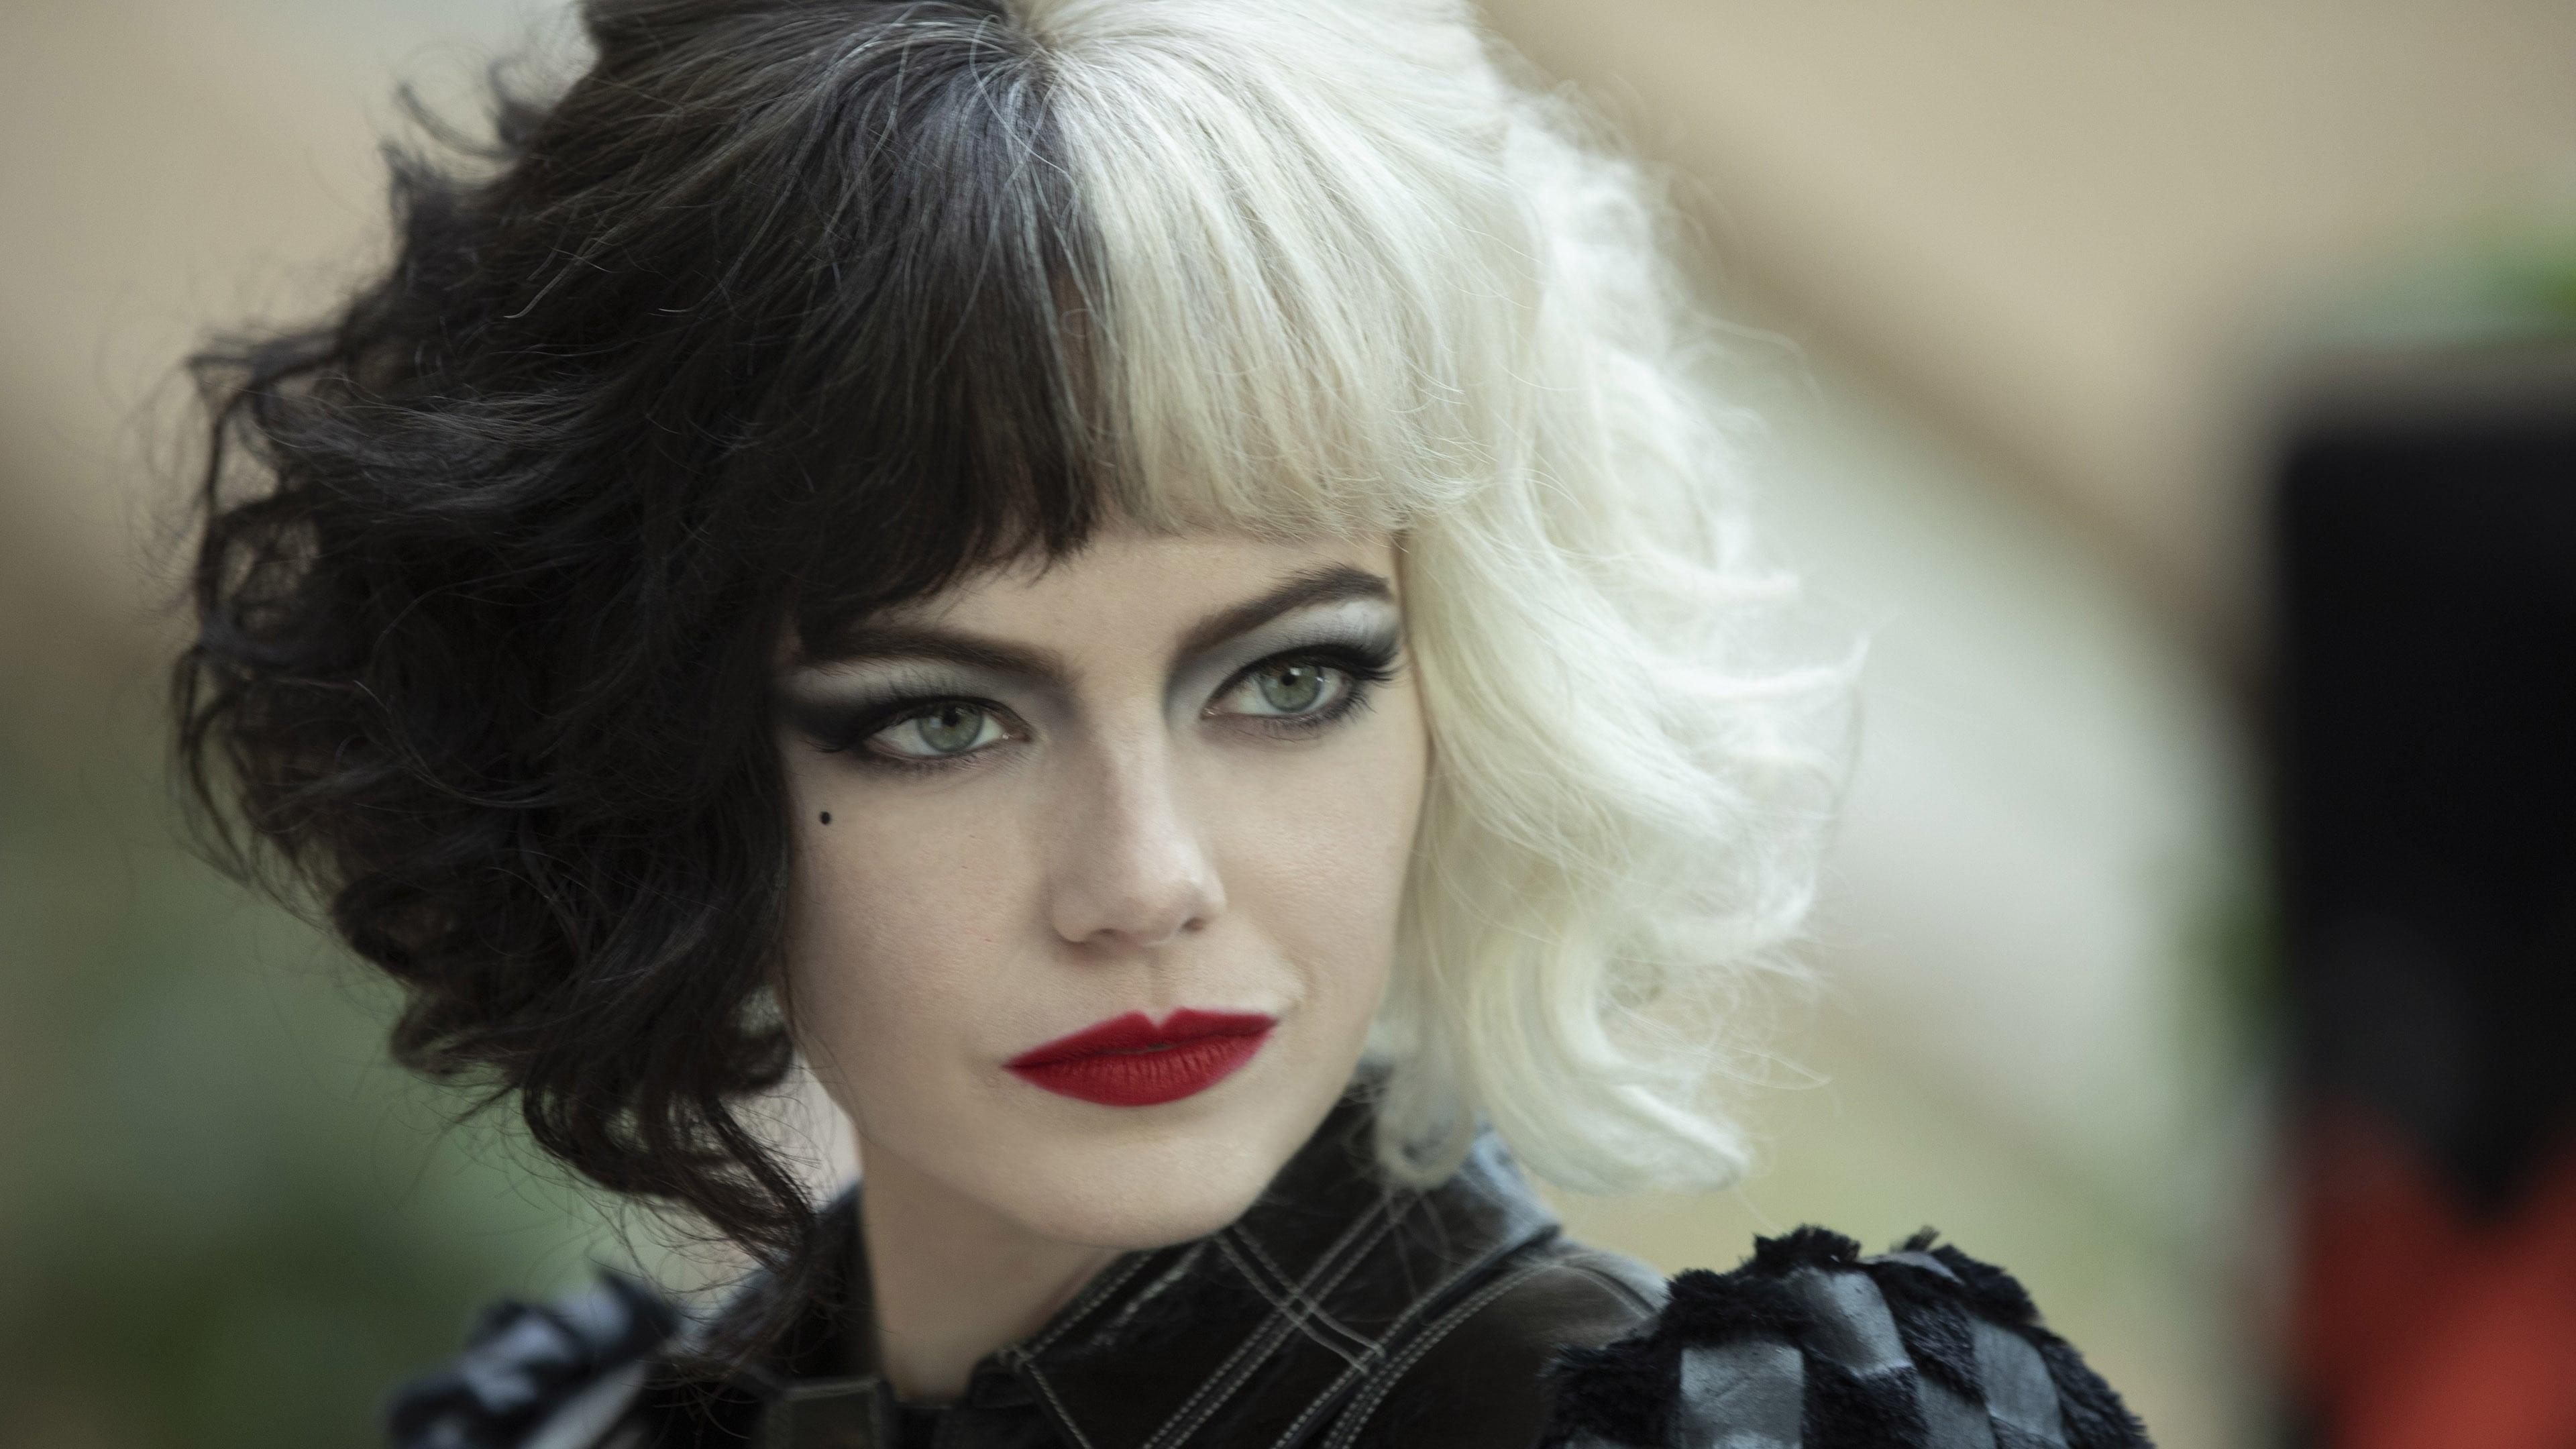 Emma Stone in Cruella Movie Wallpaper, HD Movies 4K Wallpaper | Wallpapers  Den